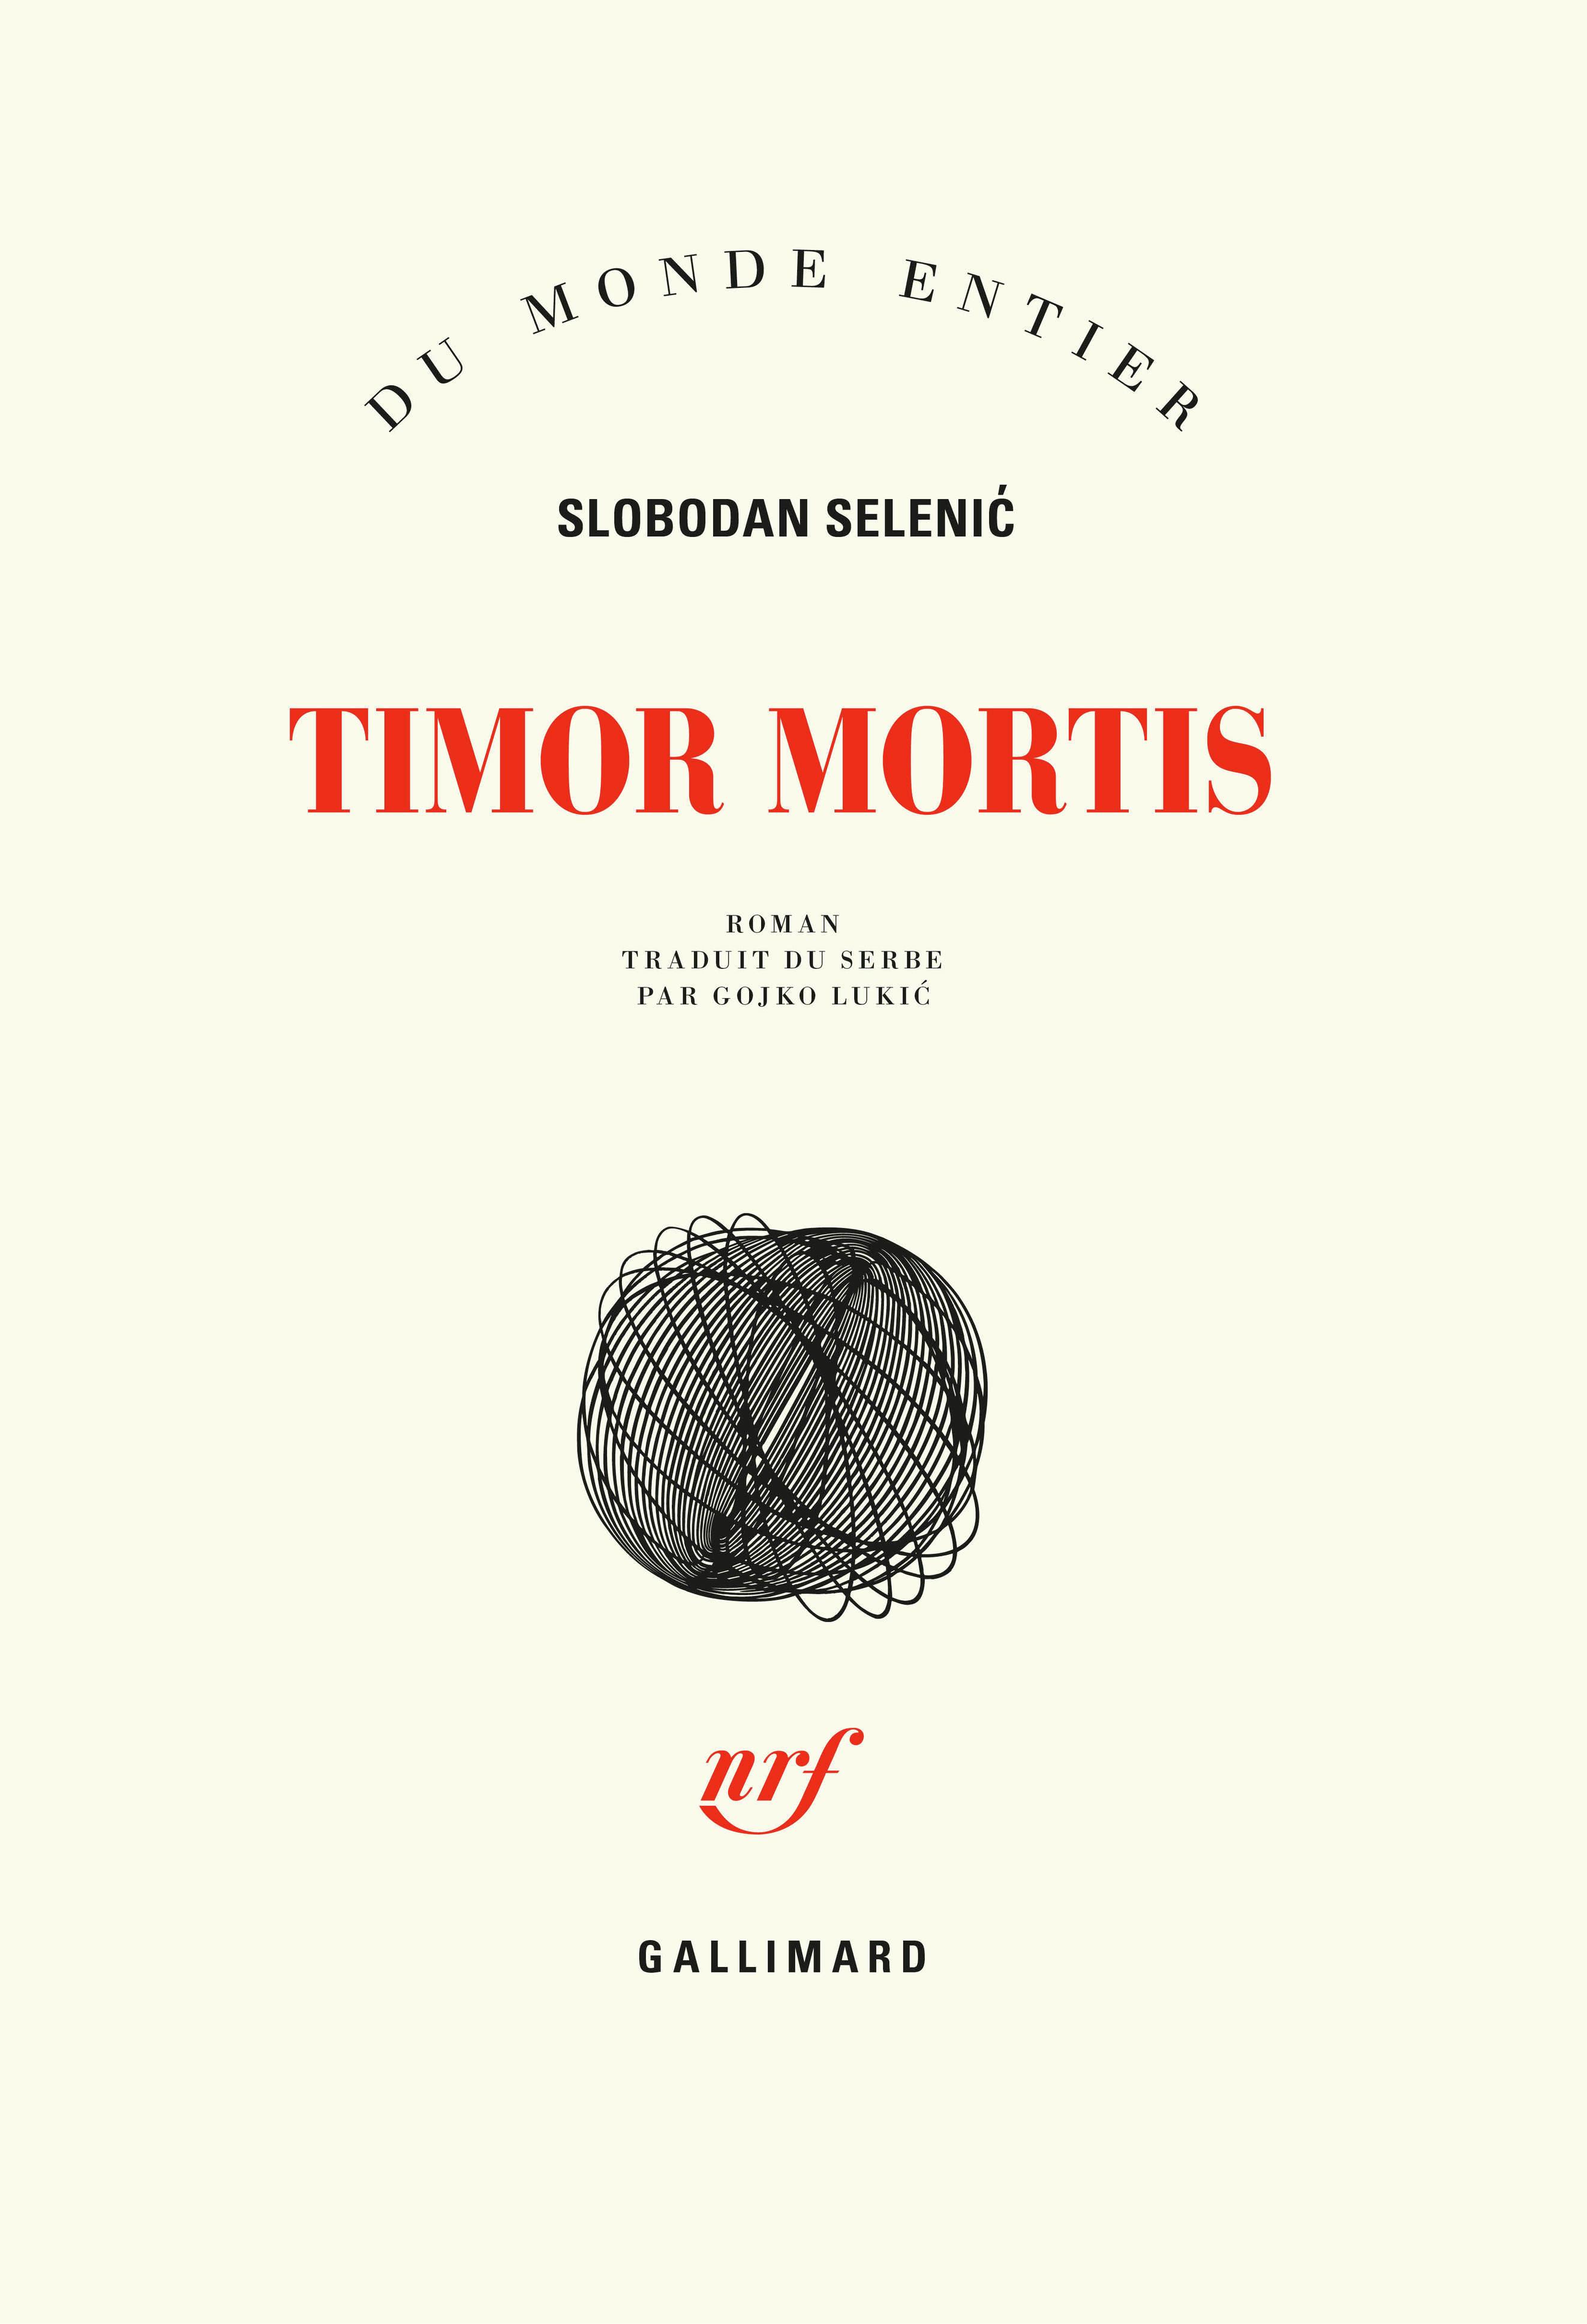 DU MONDE ENTIER - TIMOR MORTIS